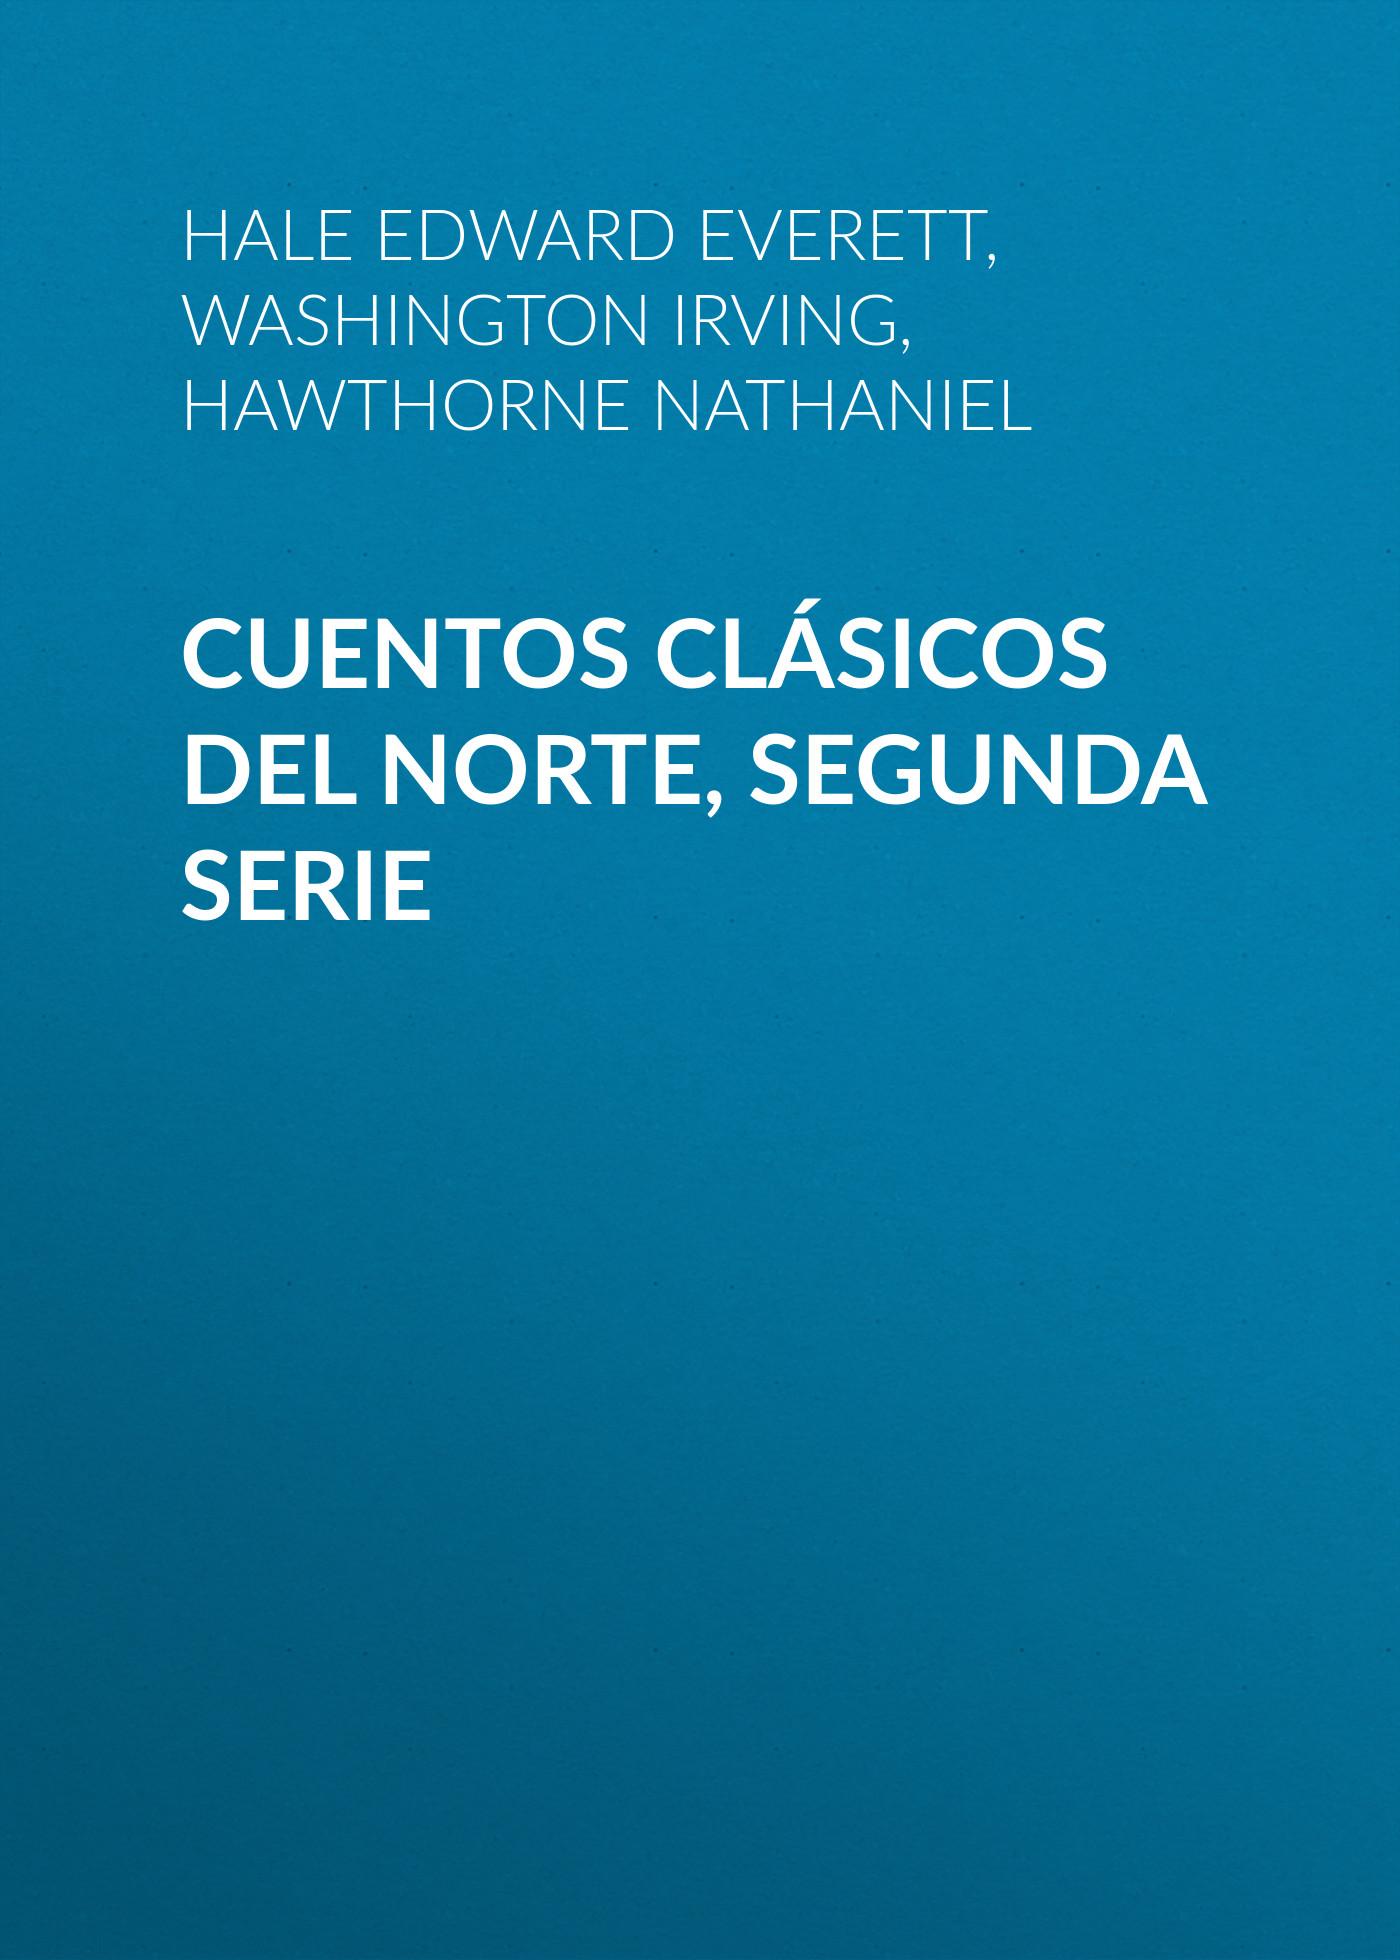 Вашингтон Ирвинг Cuentos Clásicos del Norte, Segunda Serie autumn and winter coat for women a new autumn winter coat for women